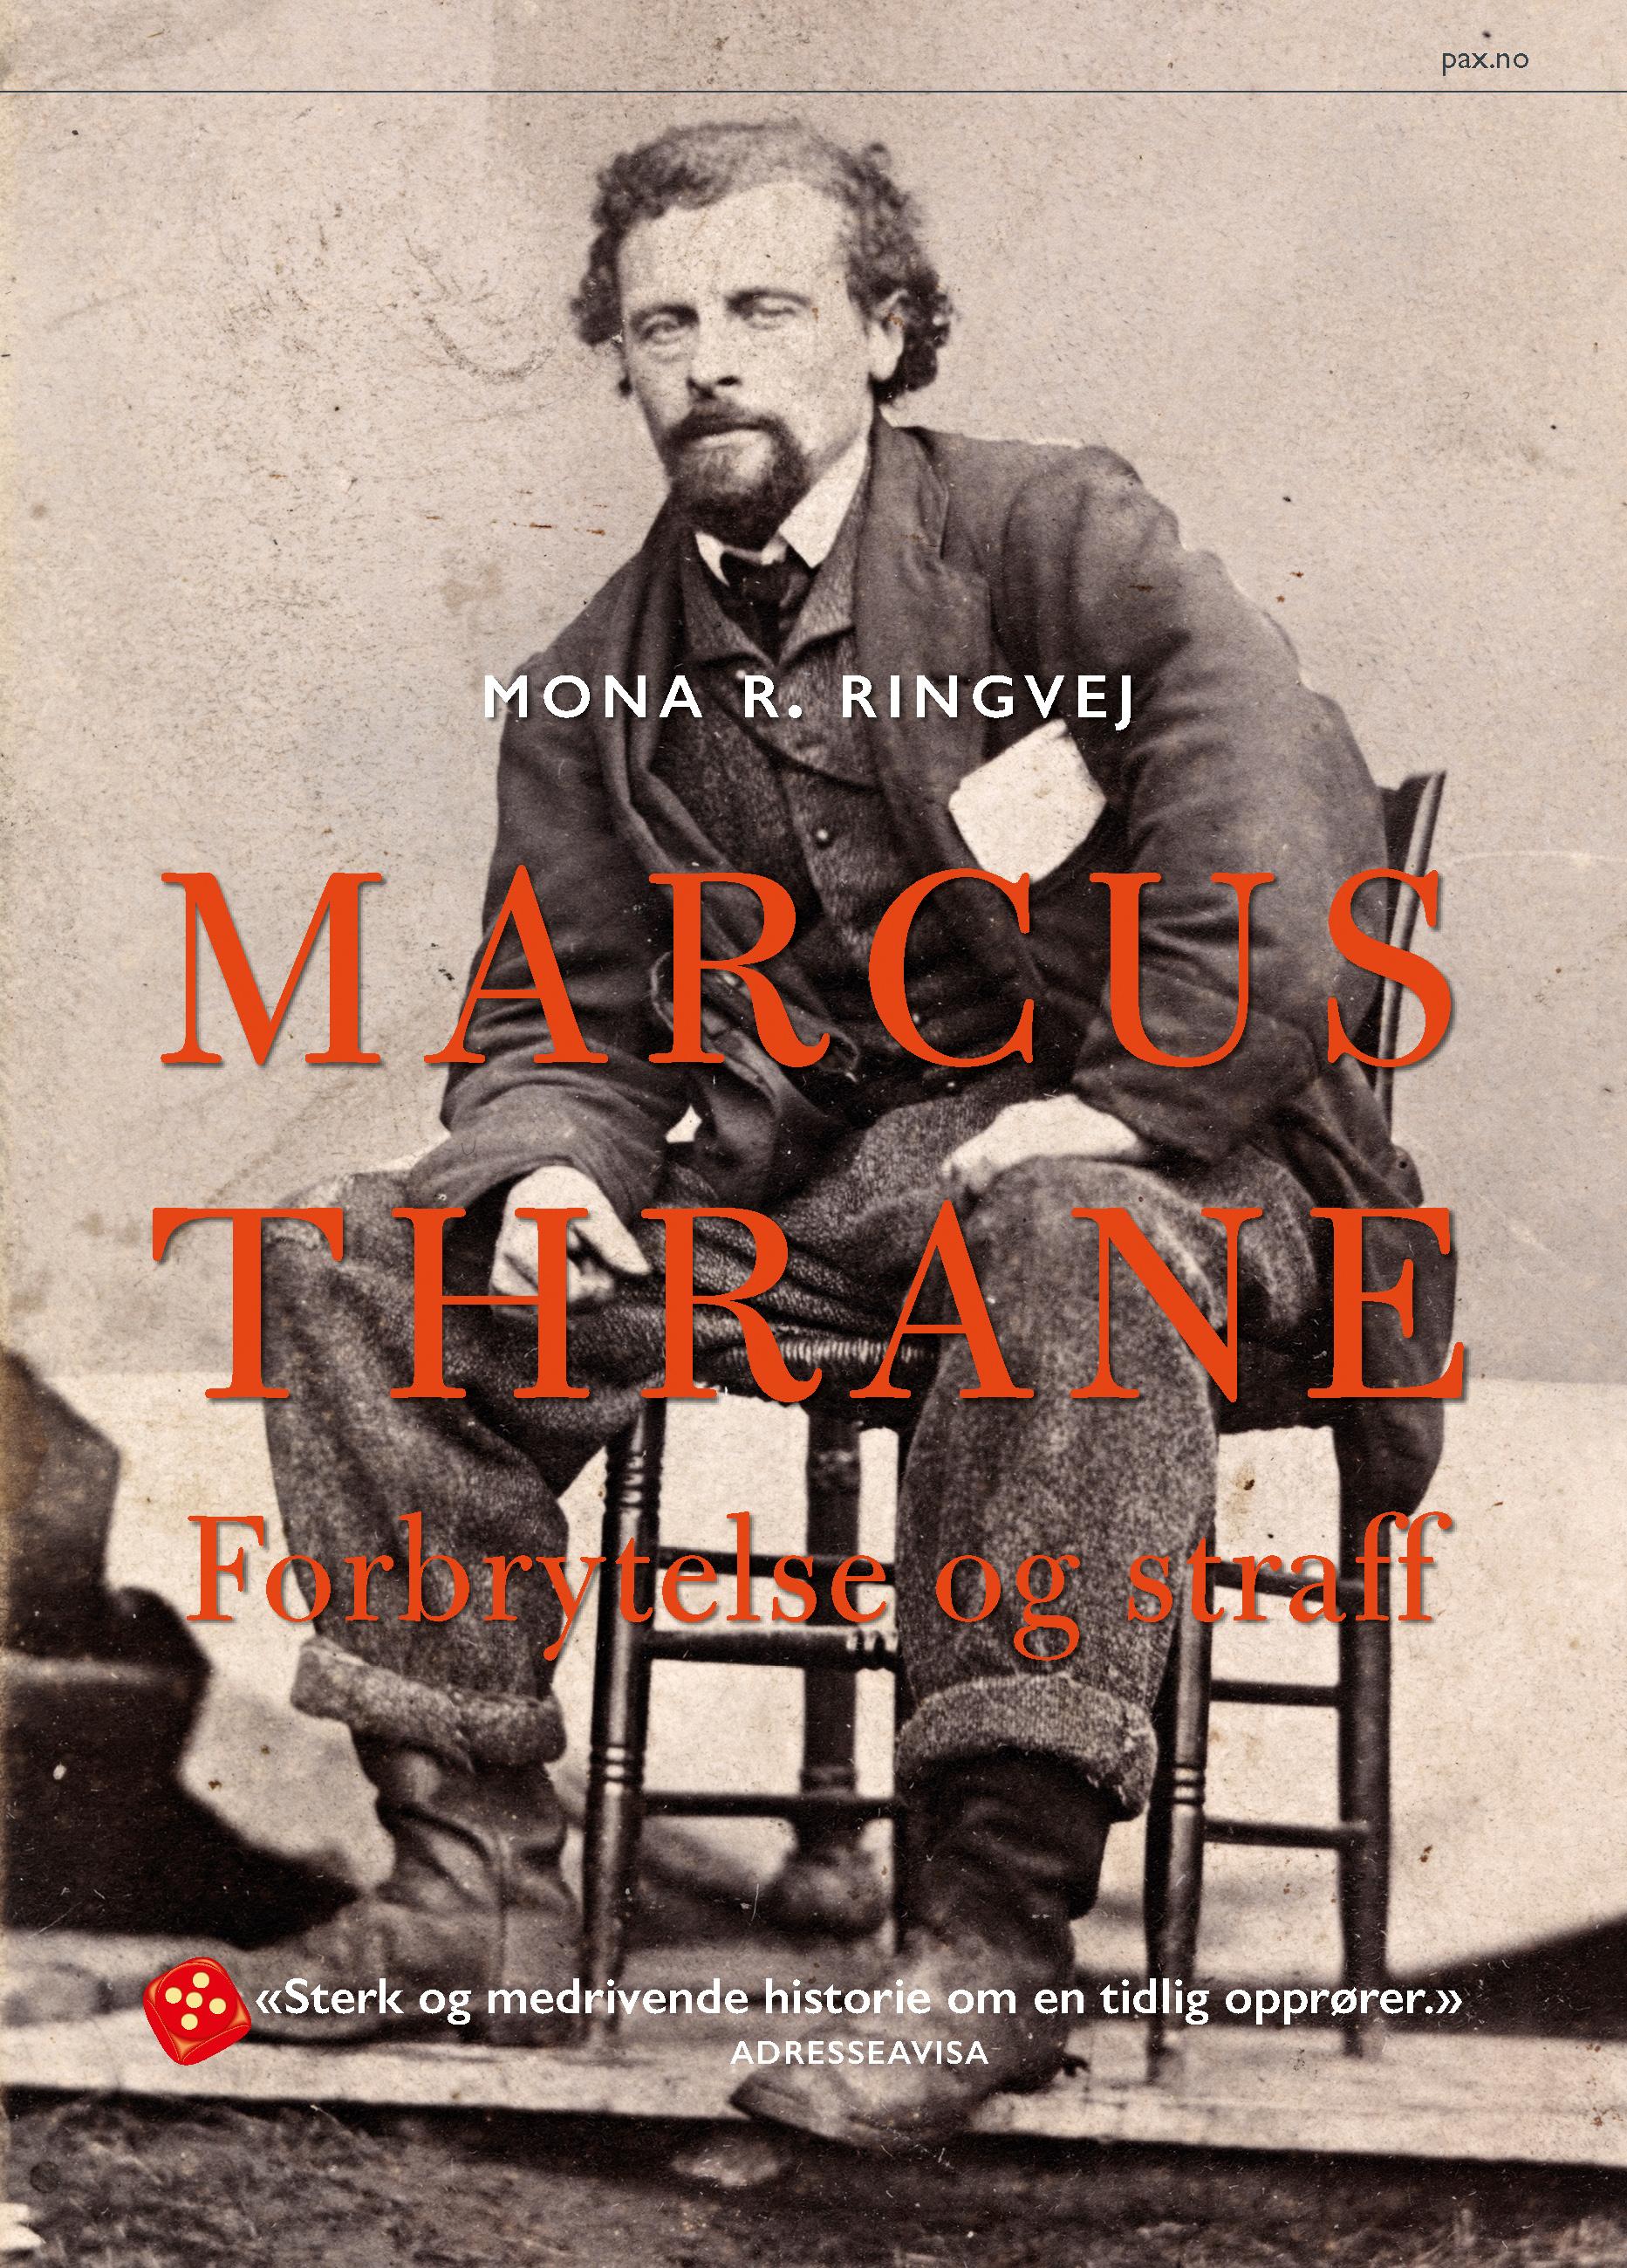 Mona R. Ringvej: Marcus Thrane - Forbrytelse og straff